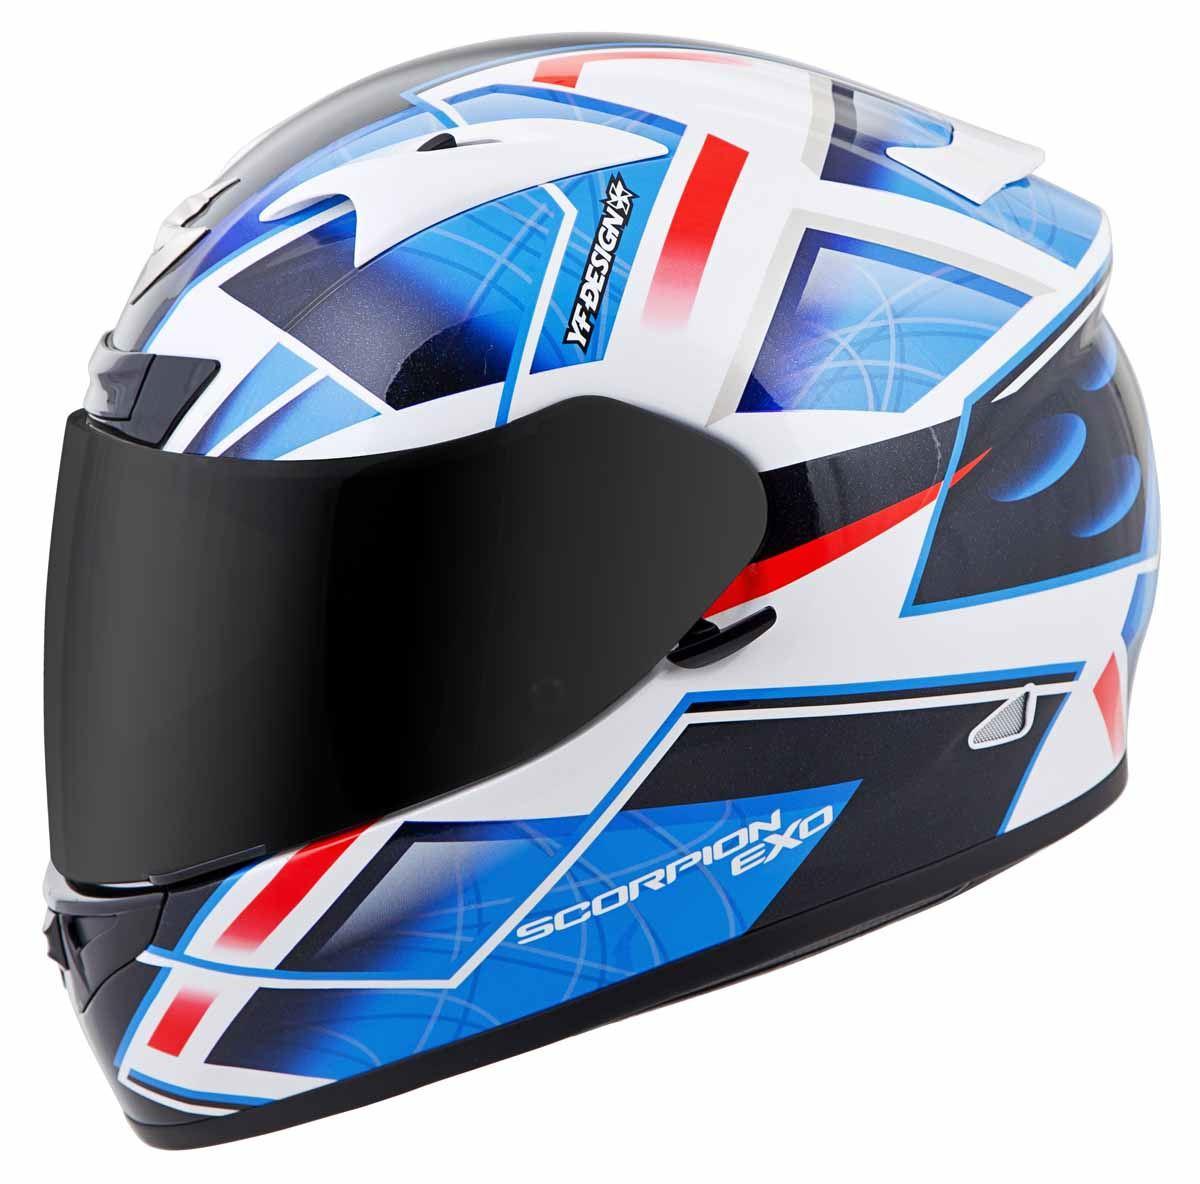 Scorpion-EXO-R710-Helmet-Fiberglass-Full-Face-DOT-SNELL-M2015-Certified-XS-2XL miniature 18